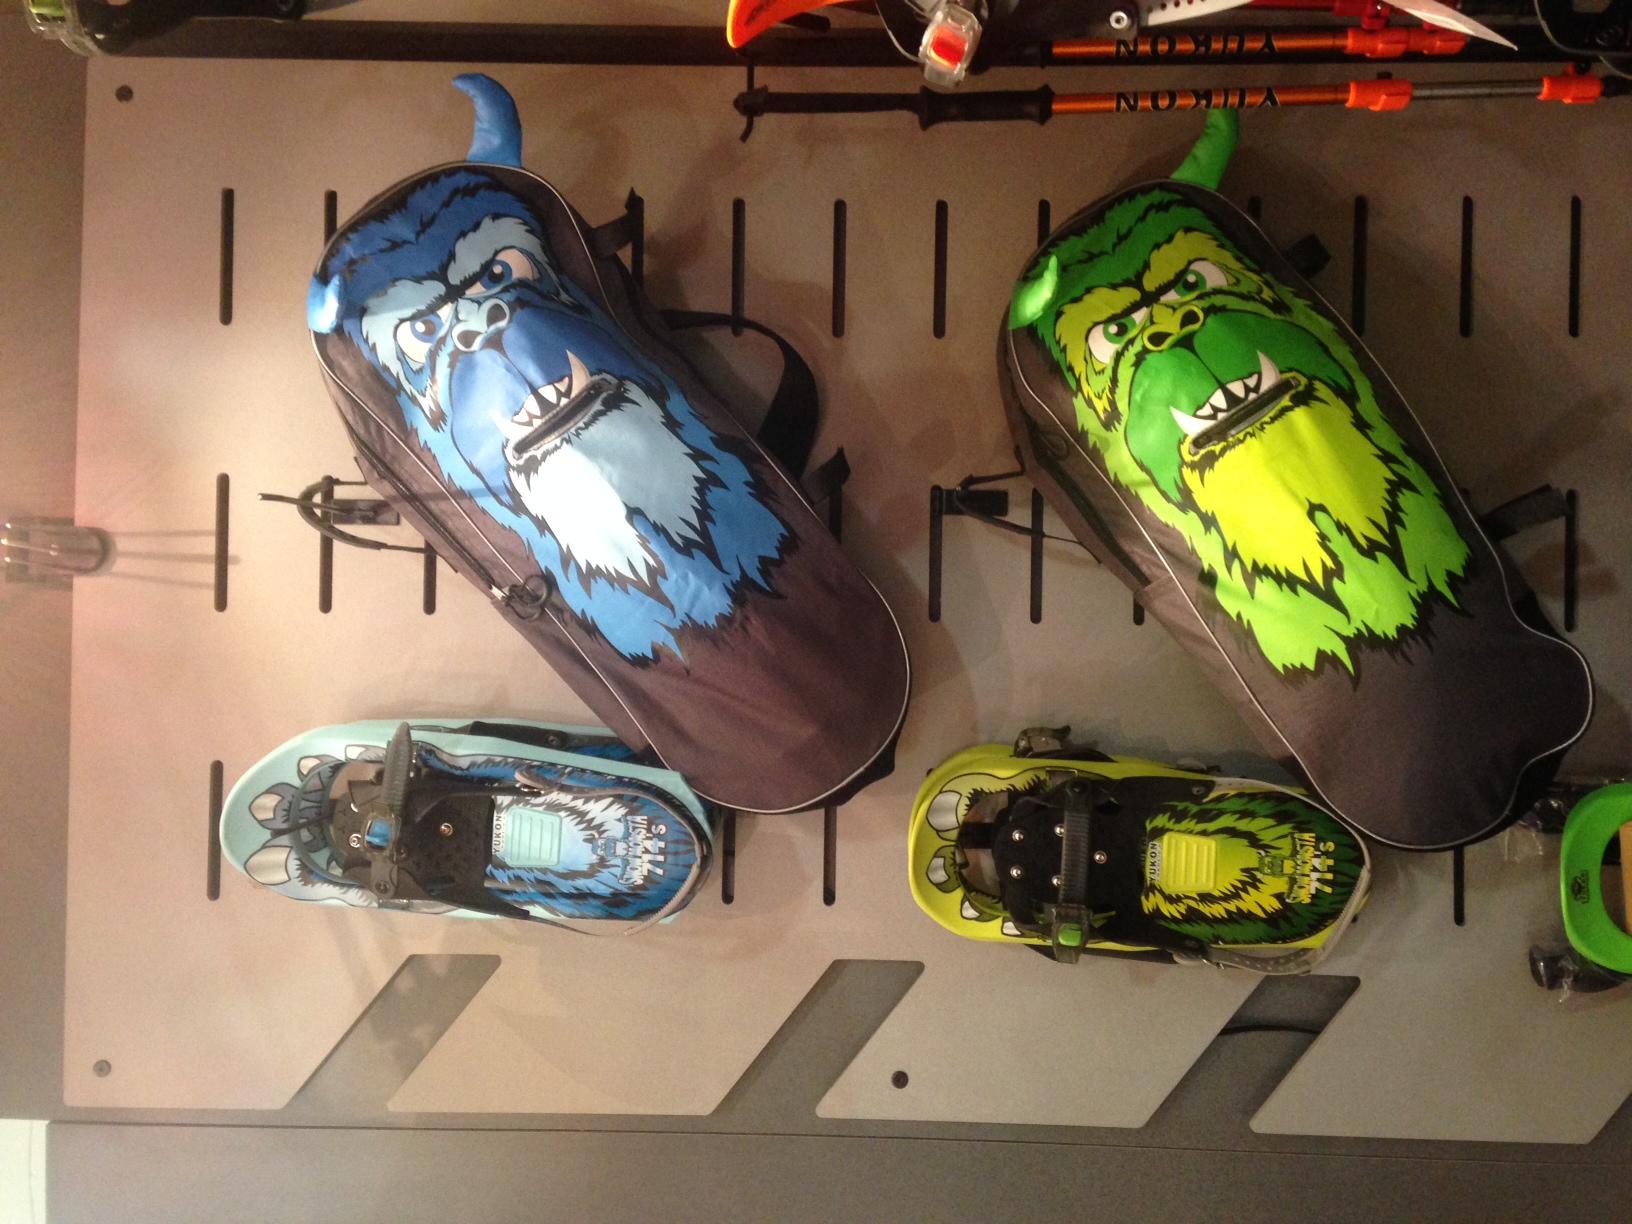 Part 1 - Outdoor Retailer: Sneak Peek at 2014/2015 Snowshoes